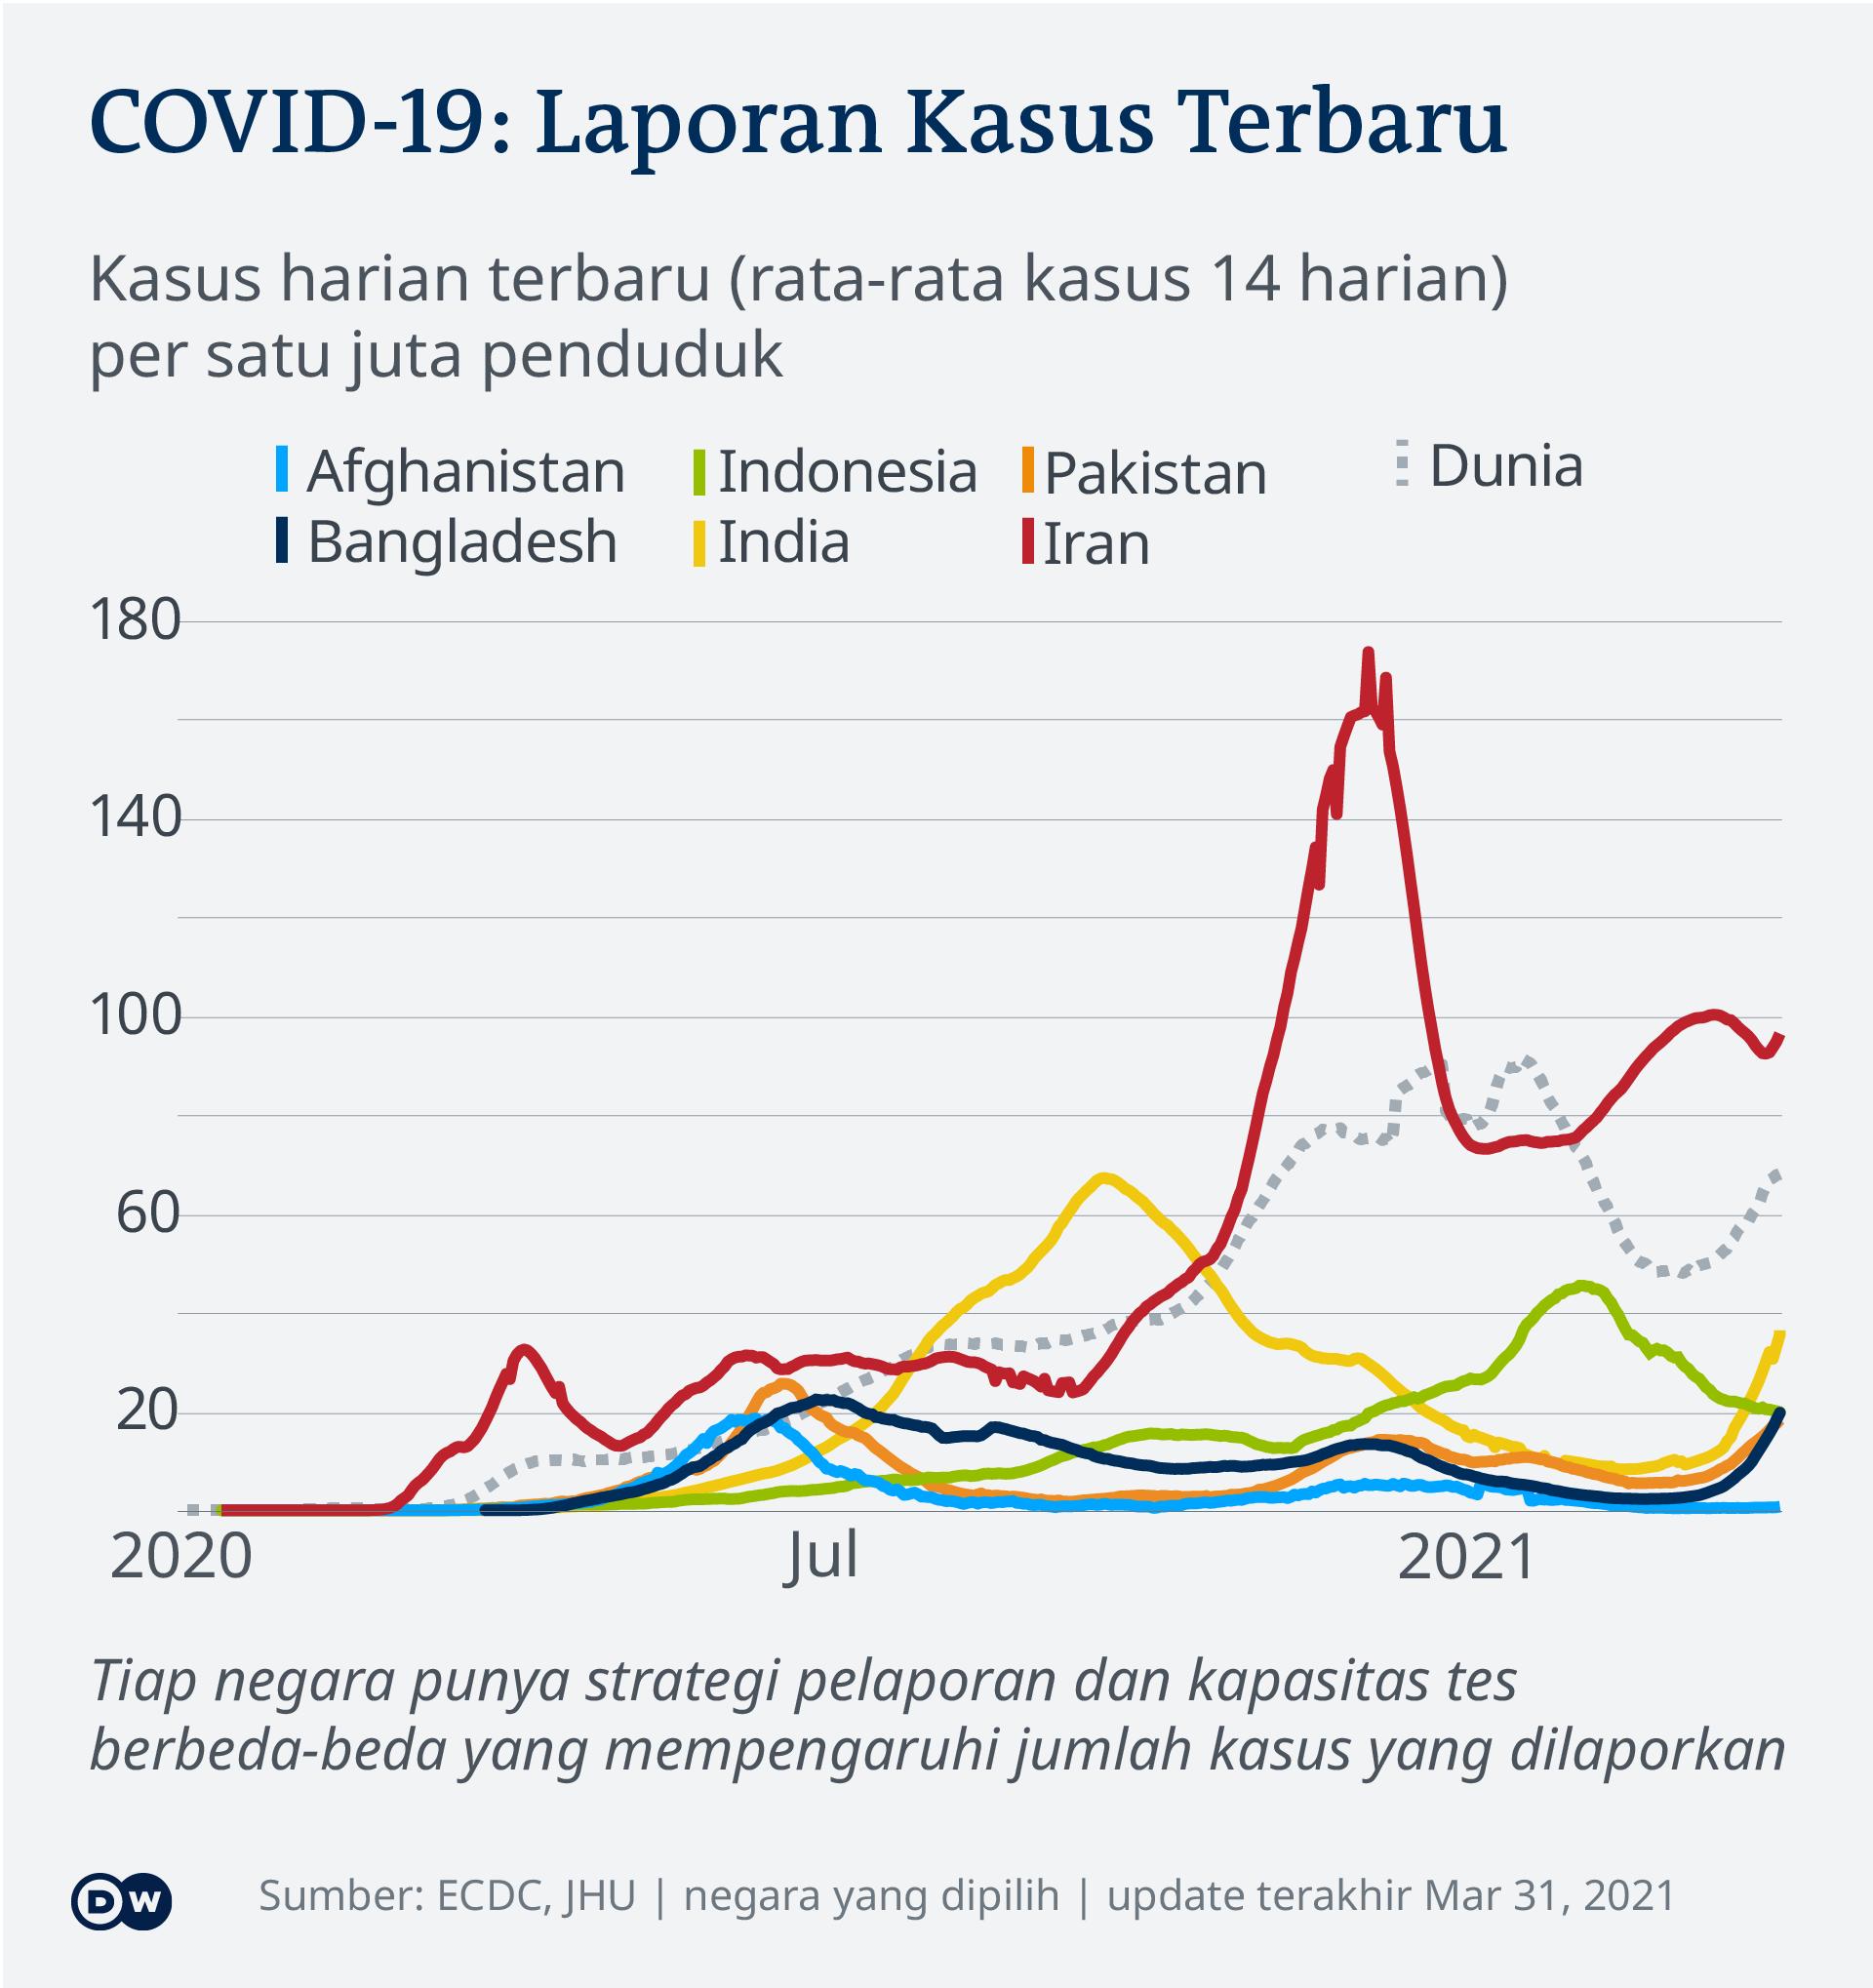 Data kasus harian baru COVID-19 di negara-negara Asia tiap satu juta penduduk, per 24 Februari 2021